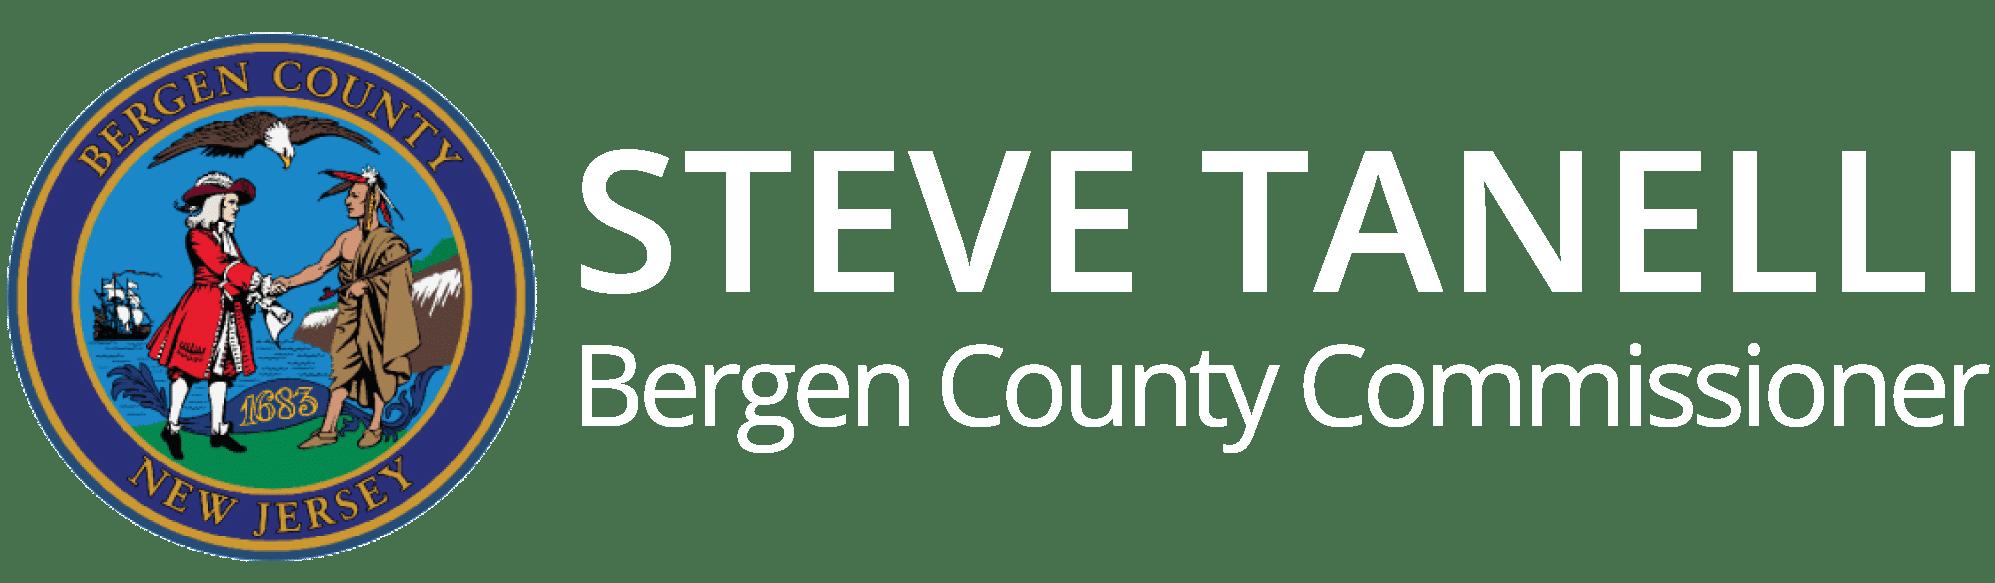 Commissioner Steve Tanelli